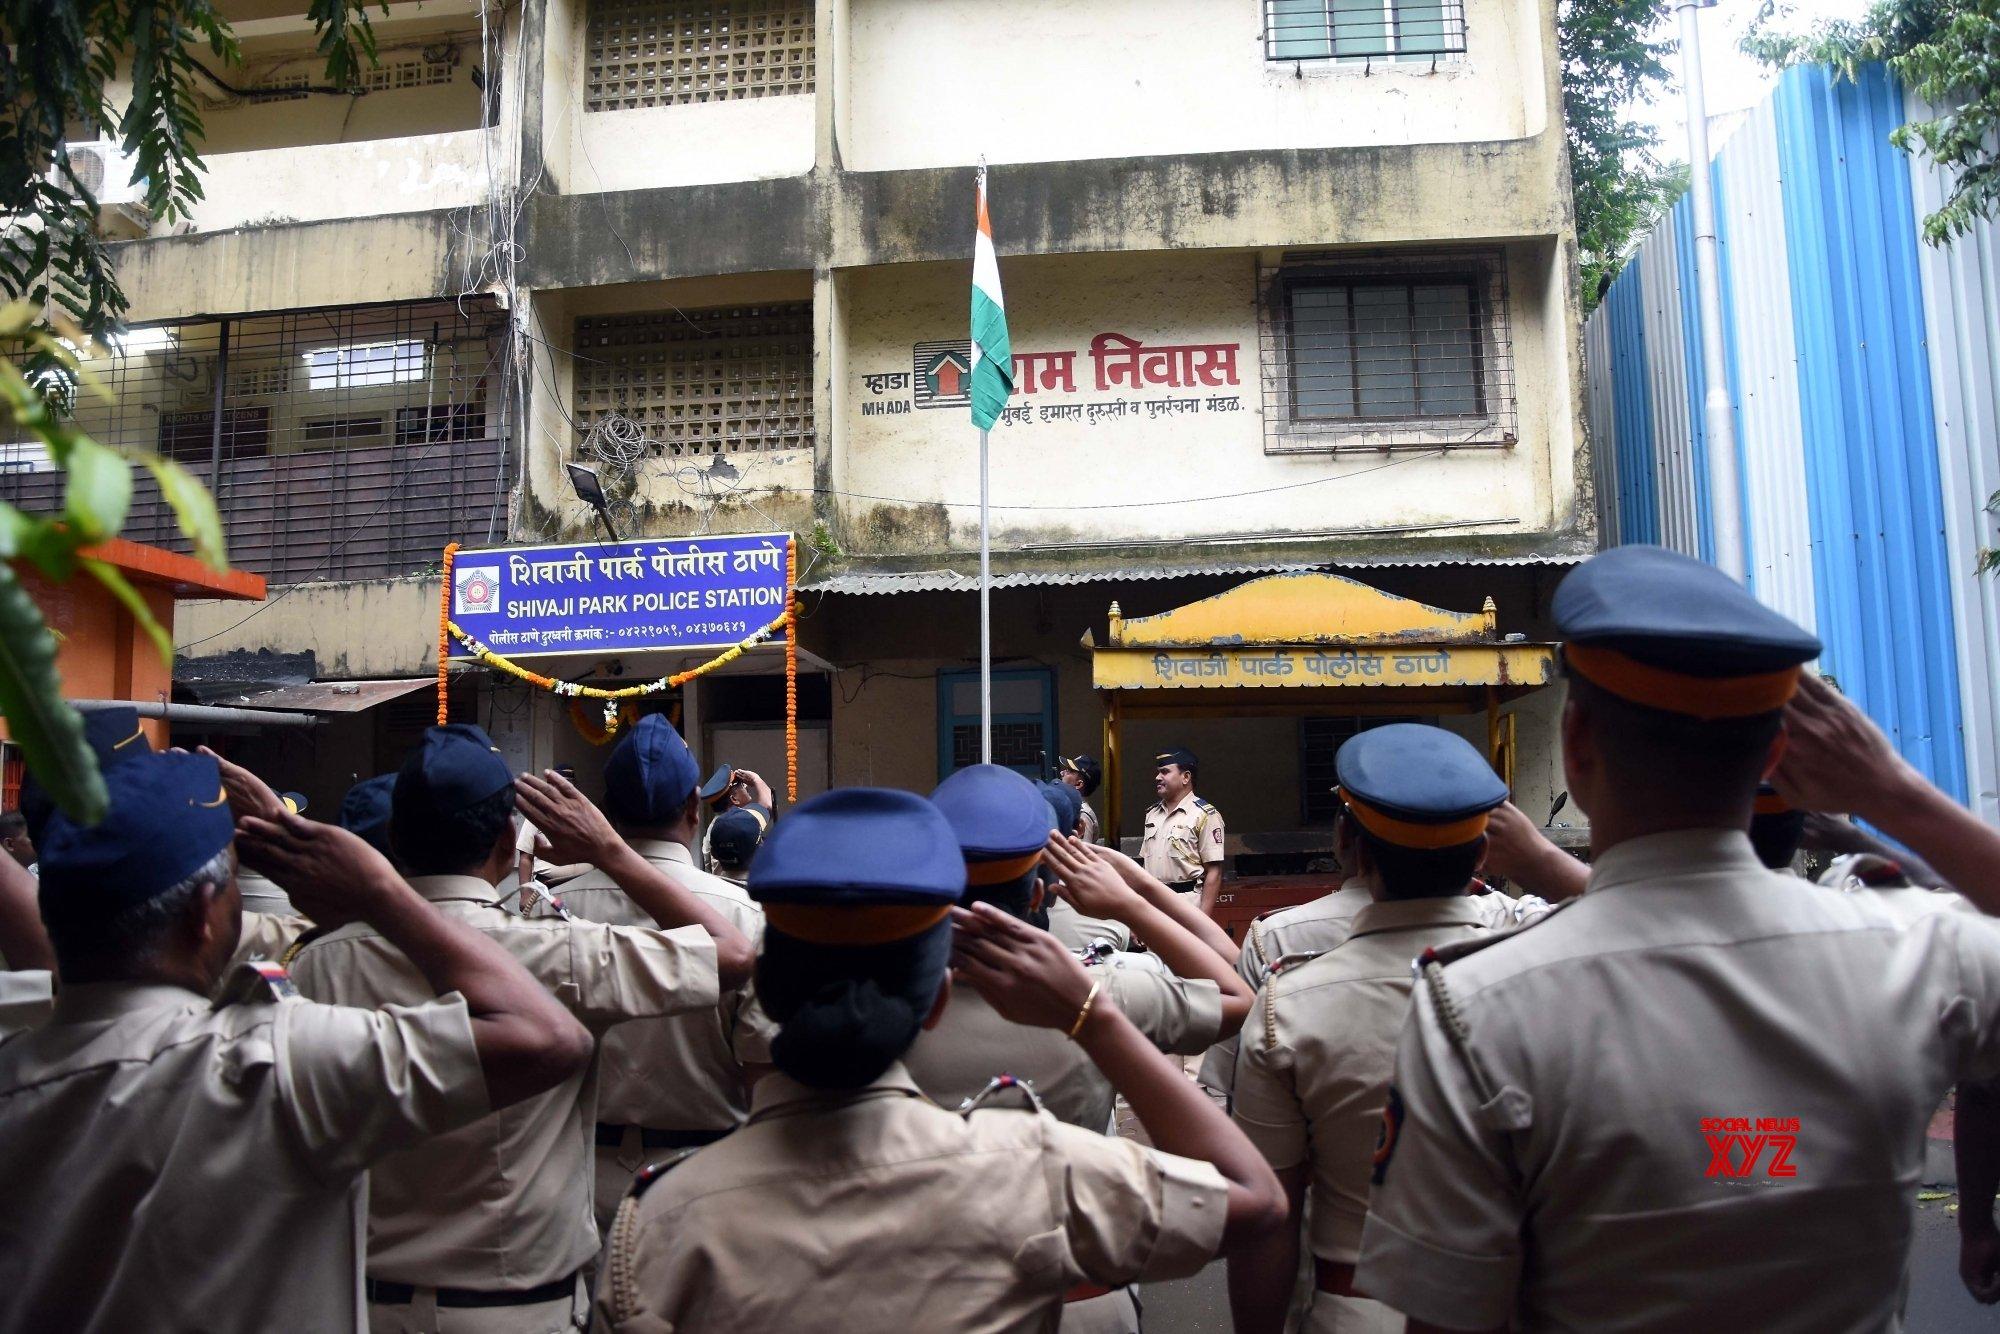 Mumbai: Mumbai Police during 73rd Independence Day celebrations #Gallery